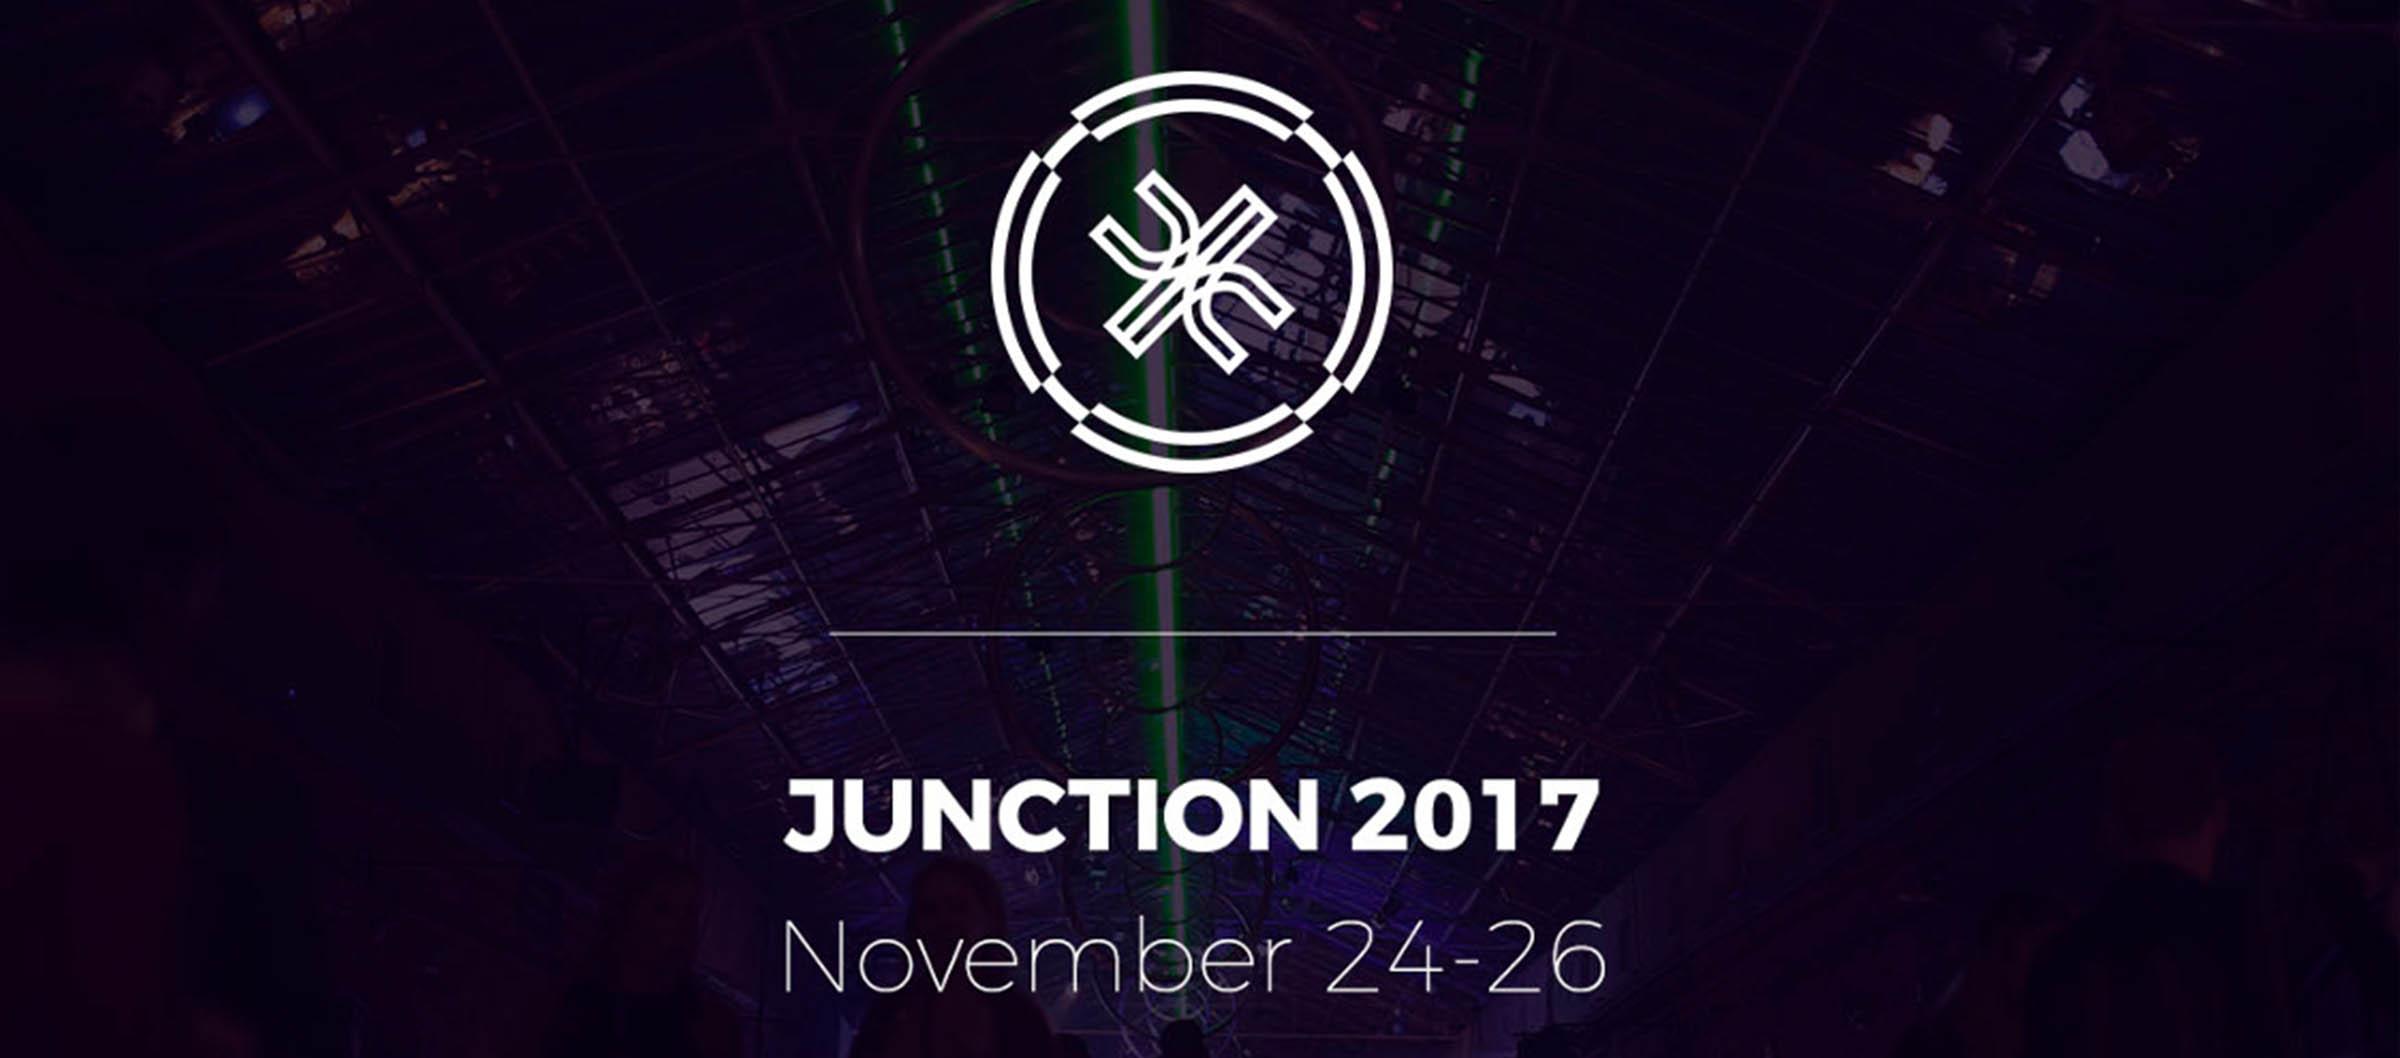 Juction 2017 Hackaton